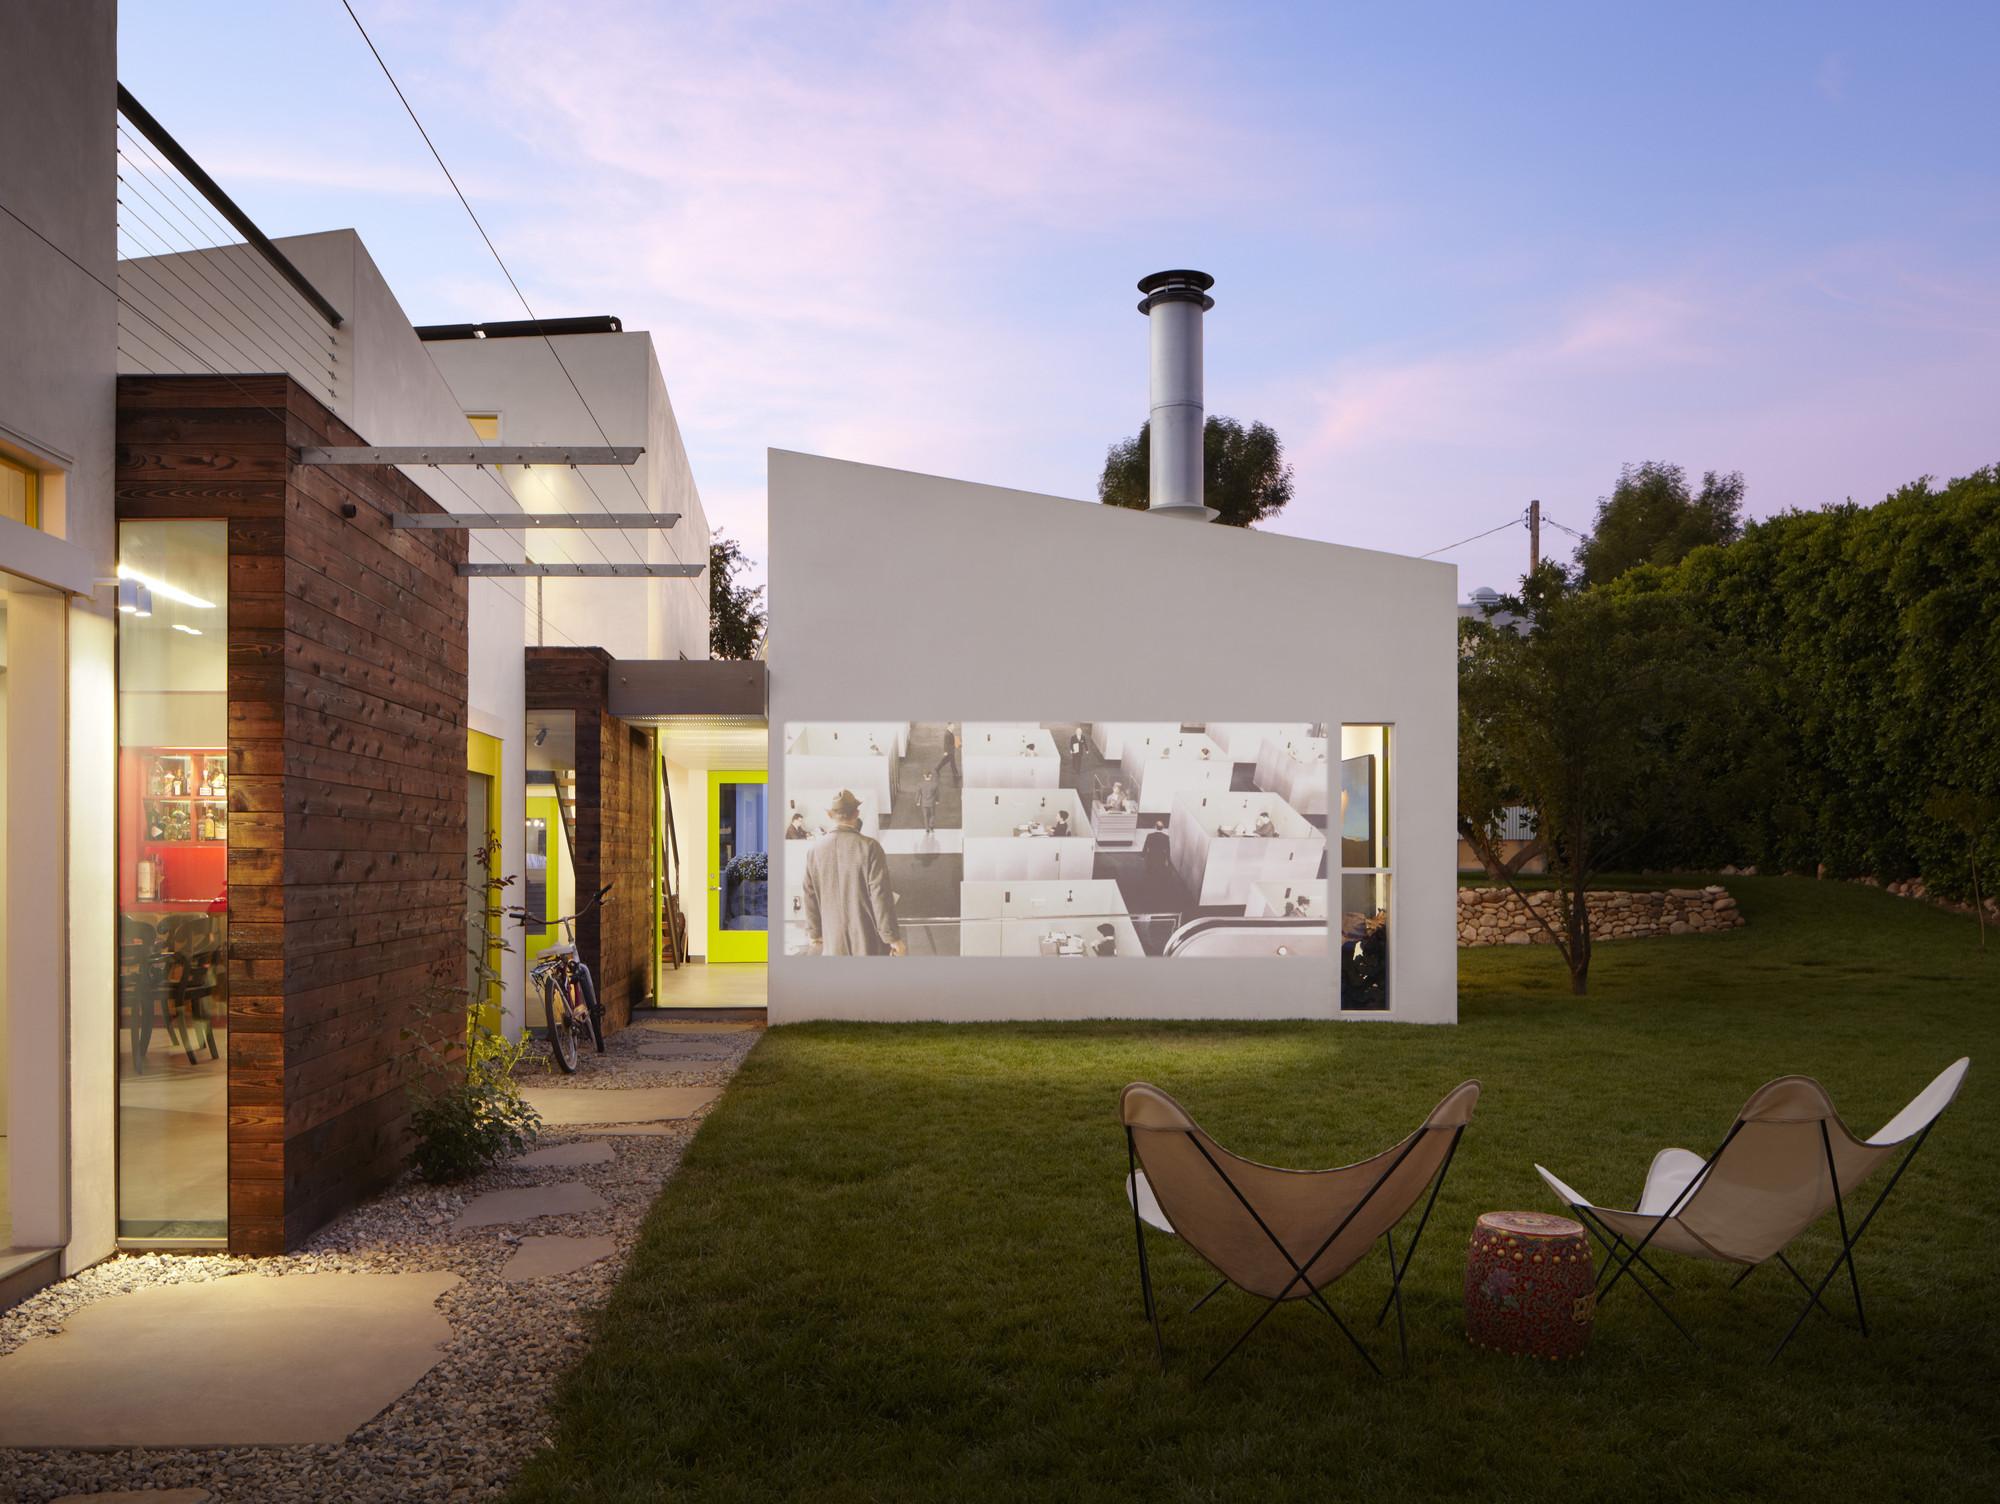 Informal House; South Pasadena, CA /Koning Eizenberg Architecture, Inc.